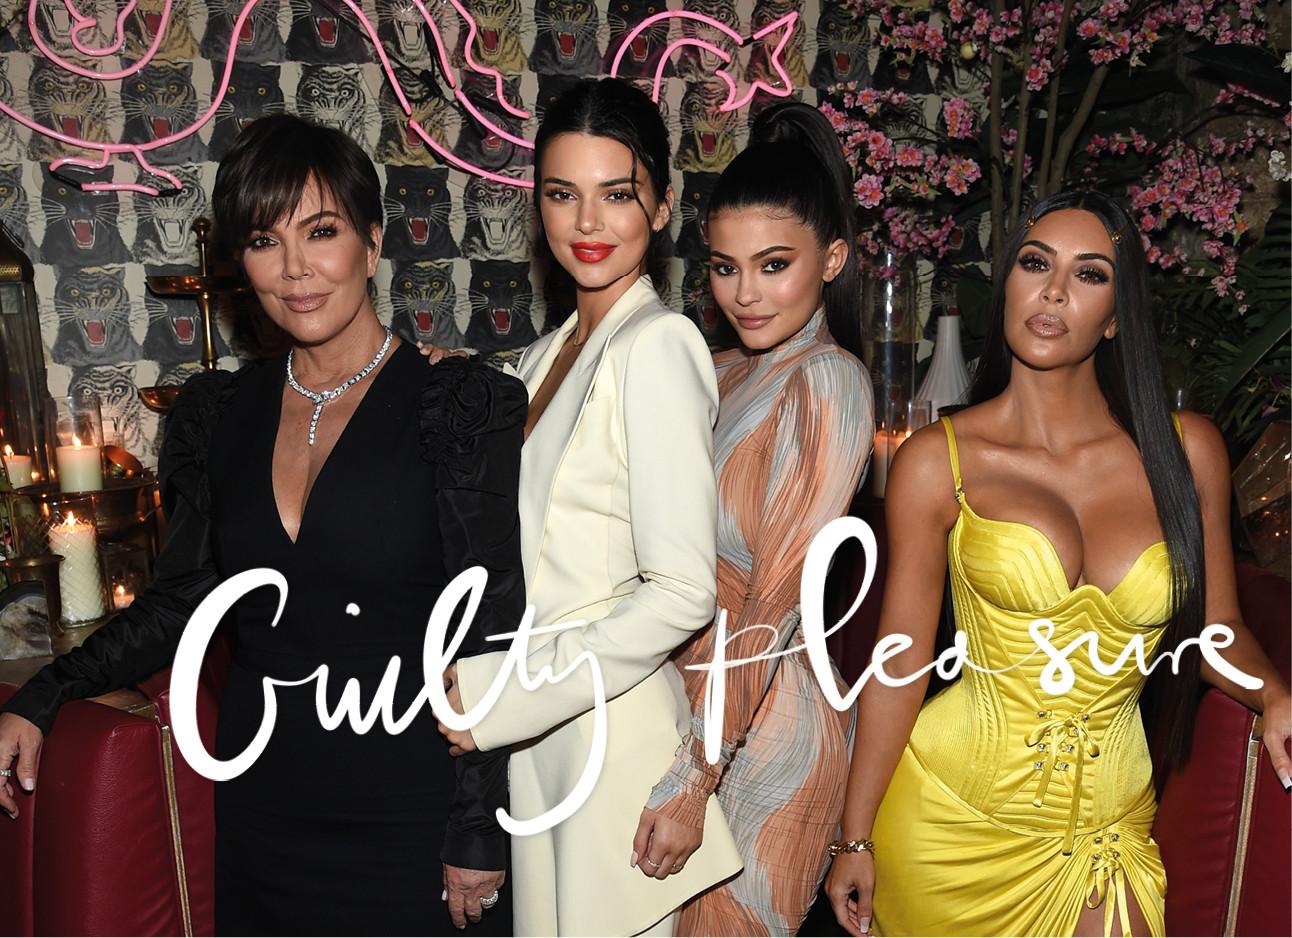 Kijk alle seizoenen van Keeping Up With The Kardashians gratis